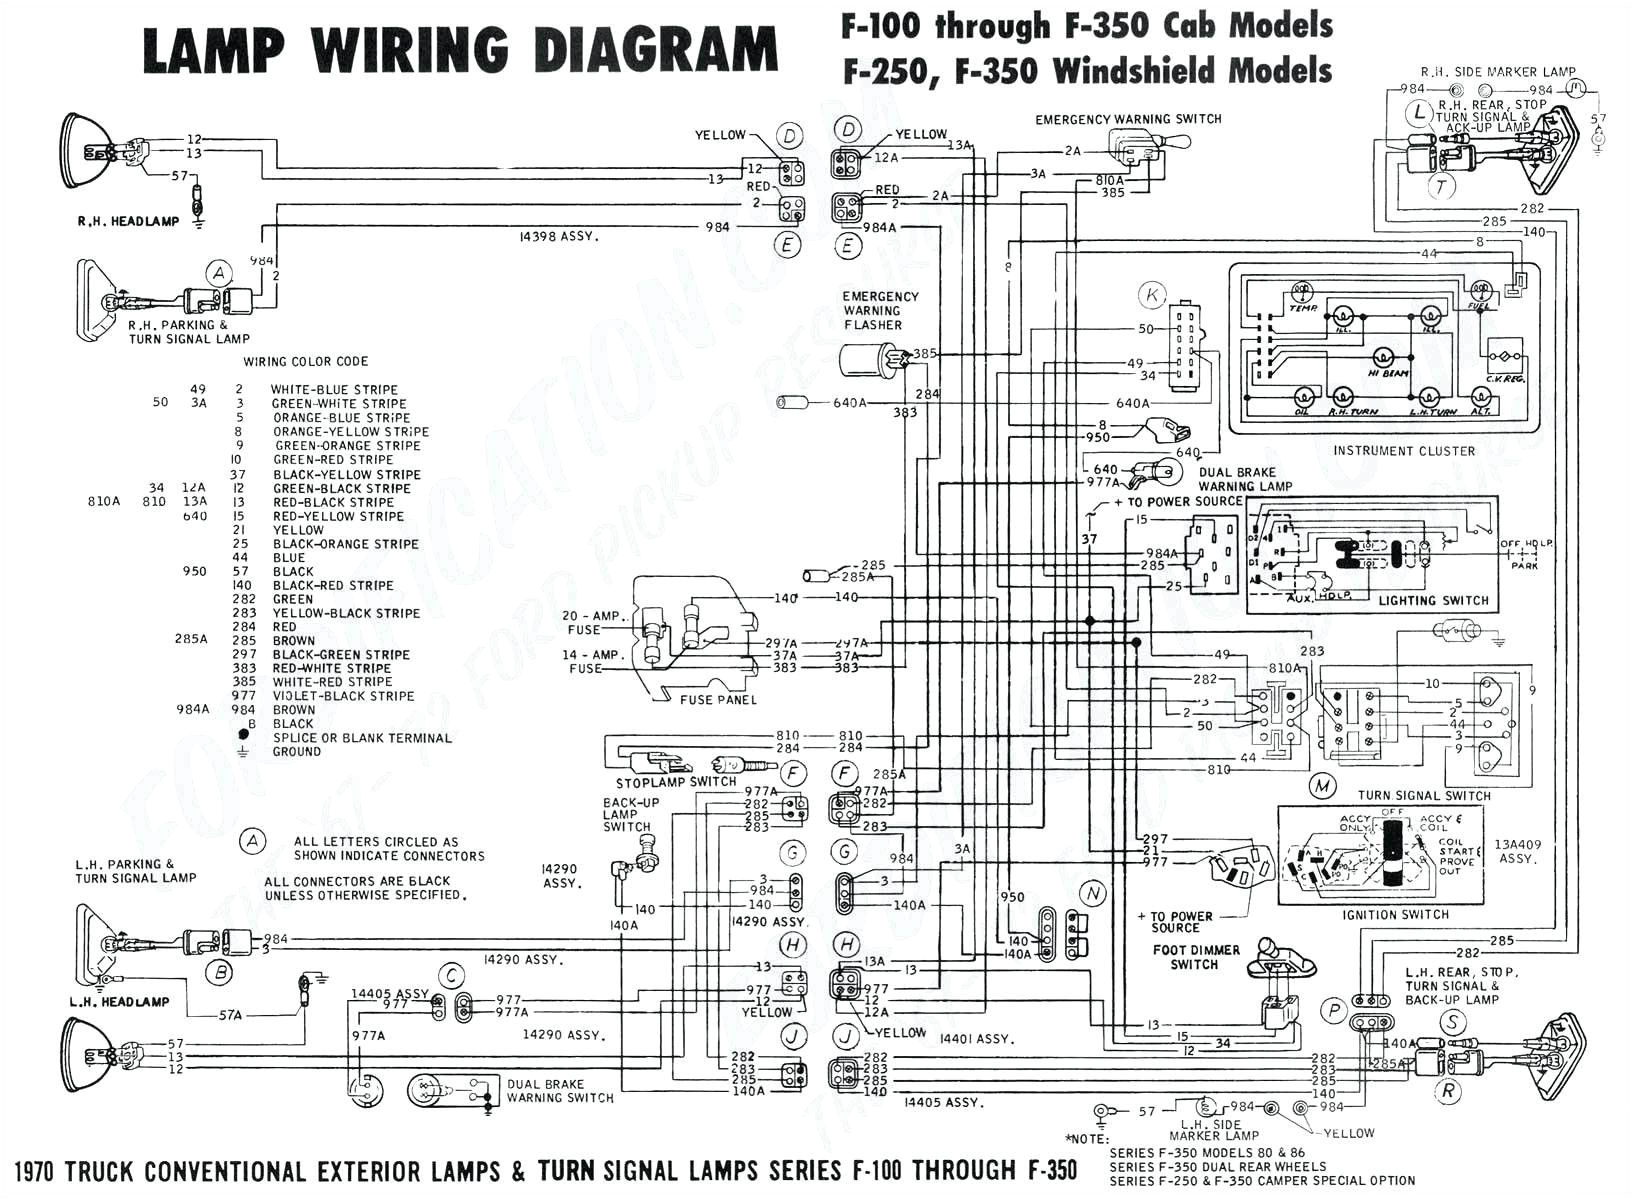 wiring diagram for pioneer fh x70bt review ebooks data schematic 2004 silverado radio harness diagram wiring